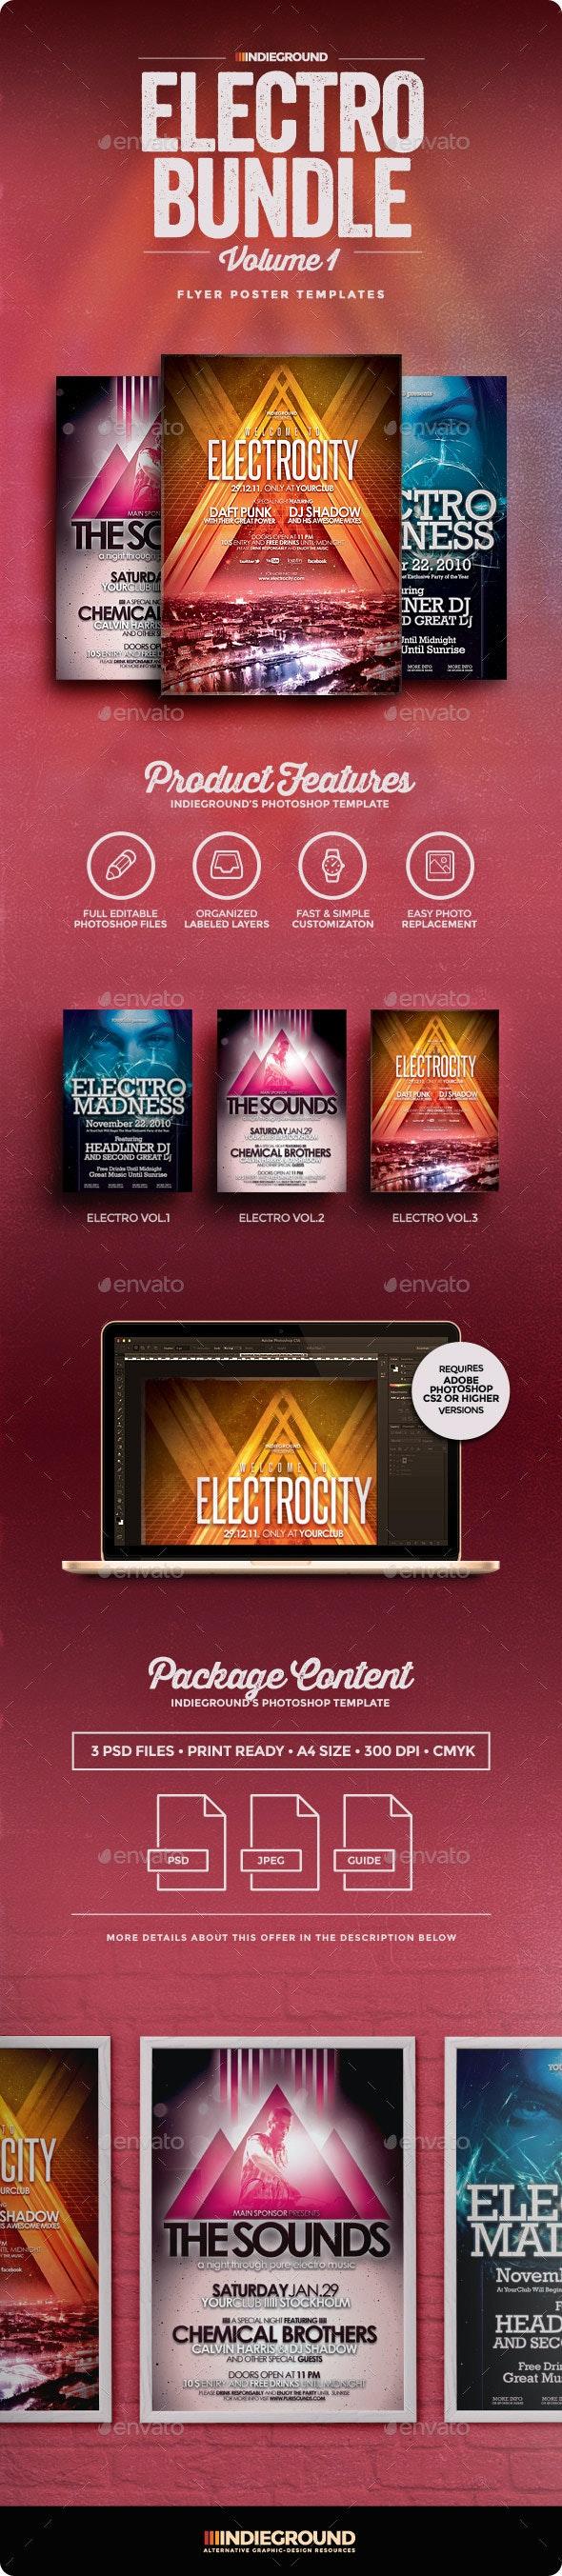 Electro Flyer/Poster Bundle Vol. 1-3 - Events Flyers